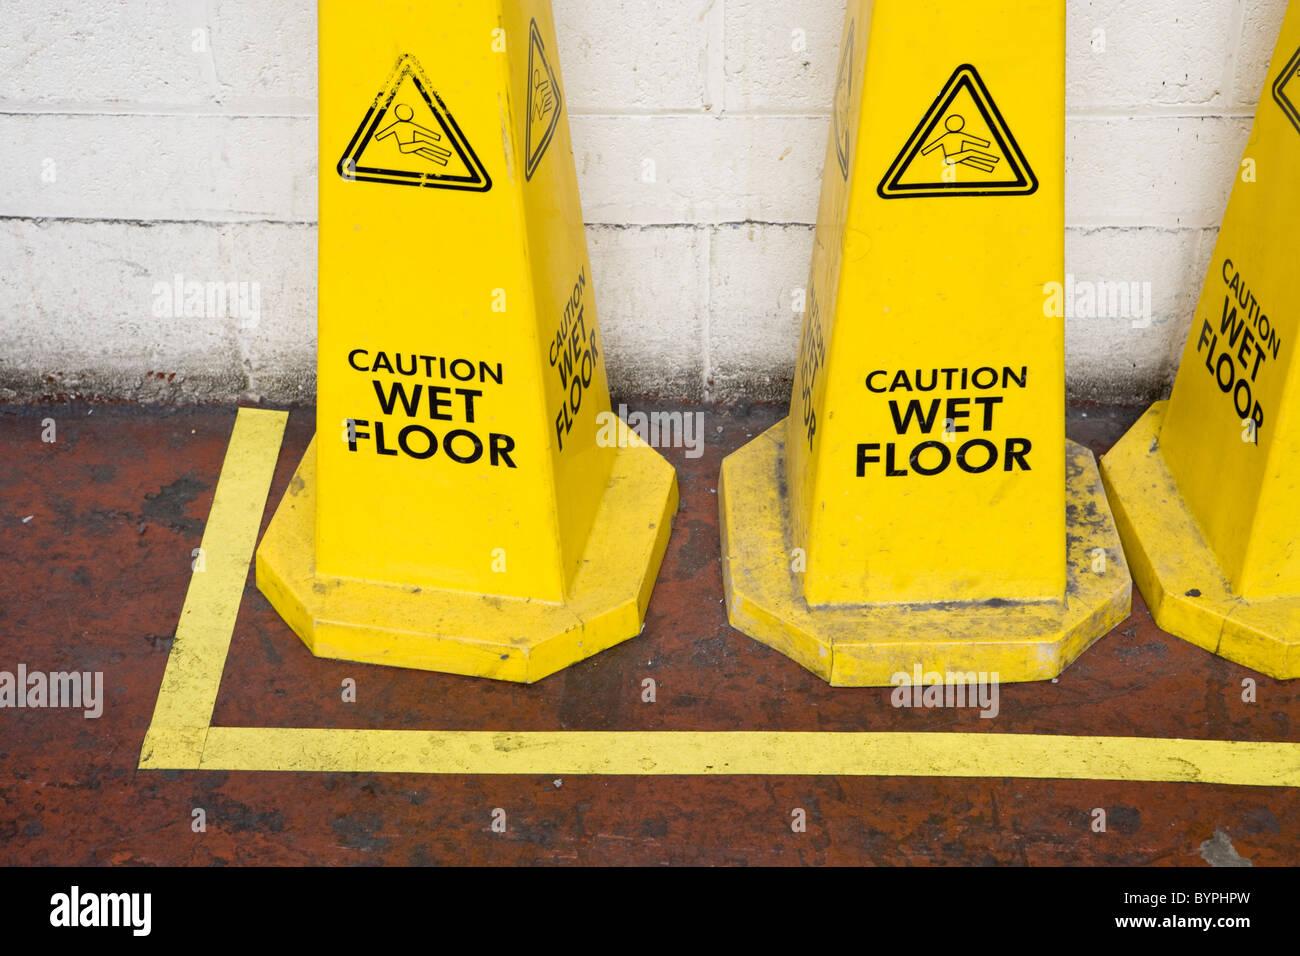 Caution wet floor signs - Stock Image